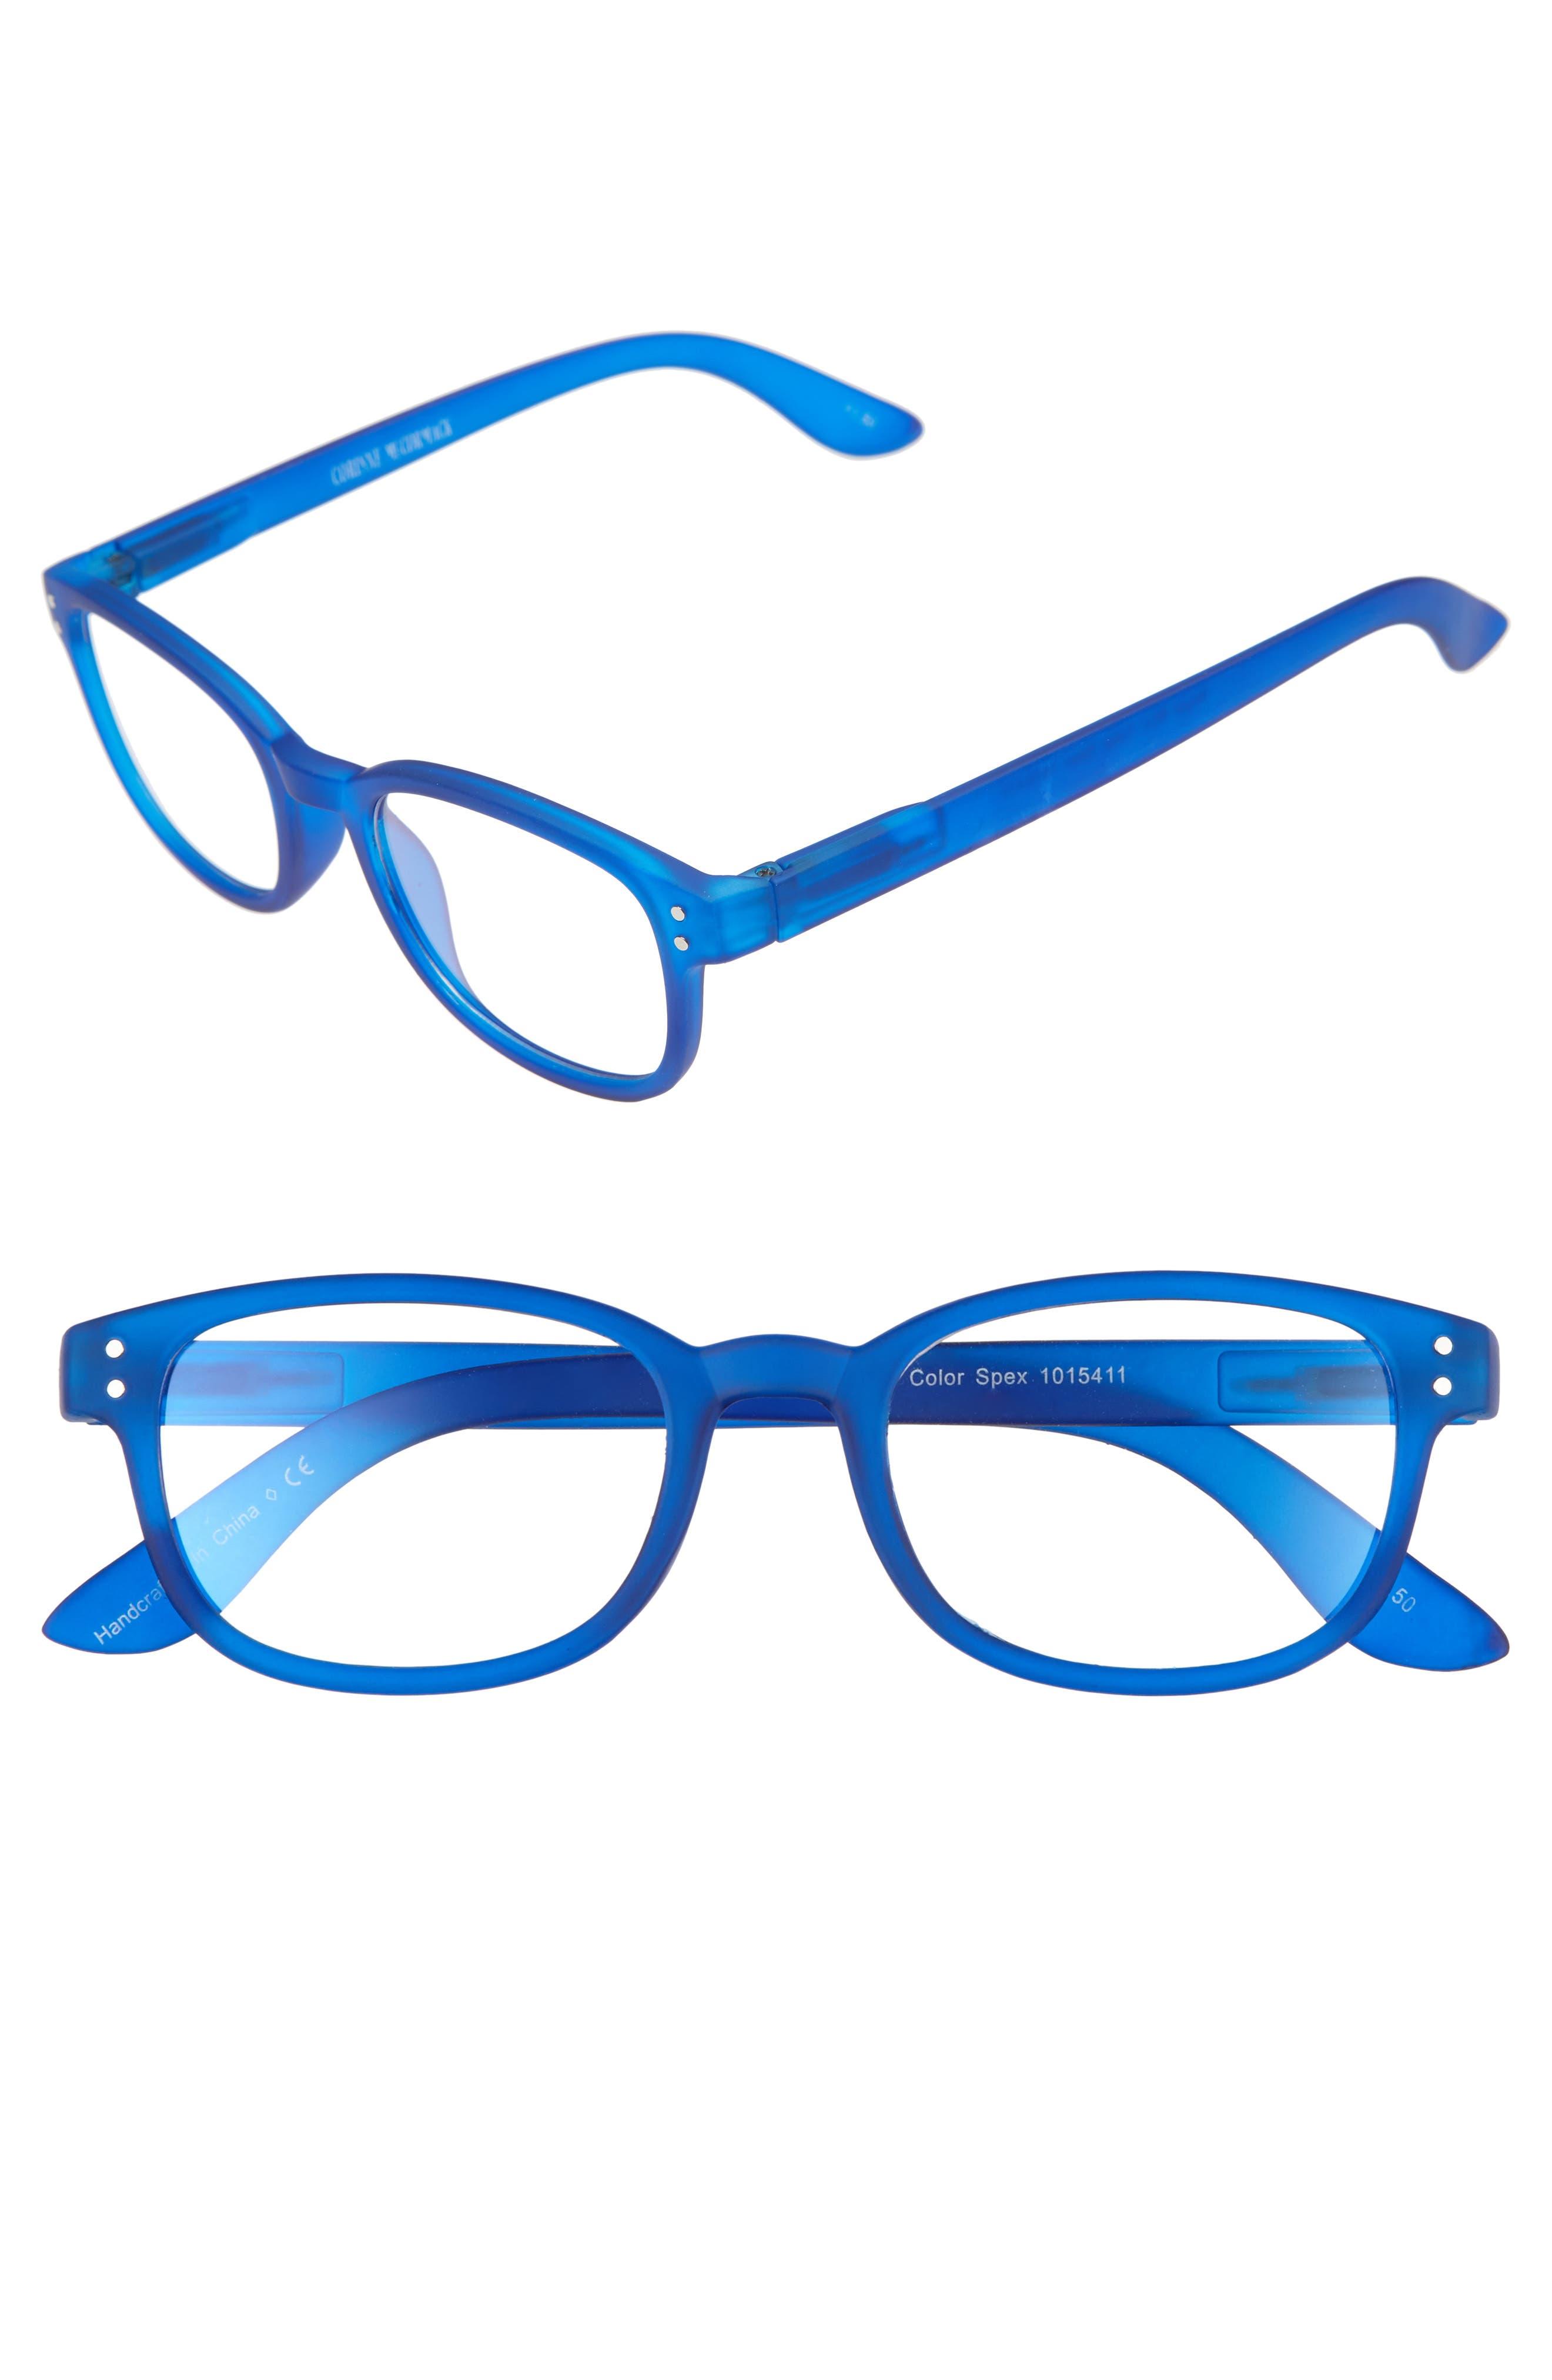 ColorSpex<sup>®</sup> 50mm Blue Light Blocking Reading Glasses,                         Main,                         color, BLUE